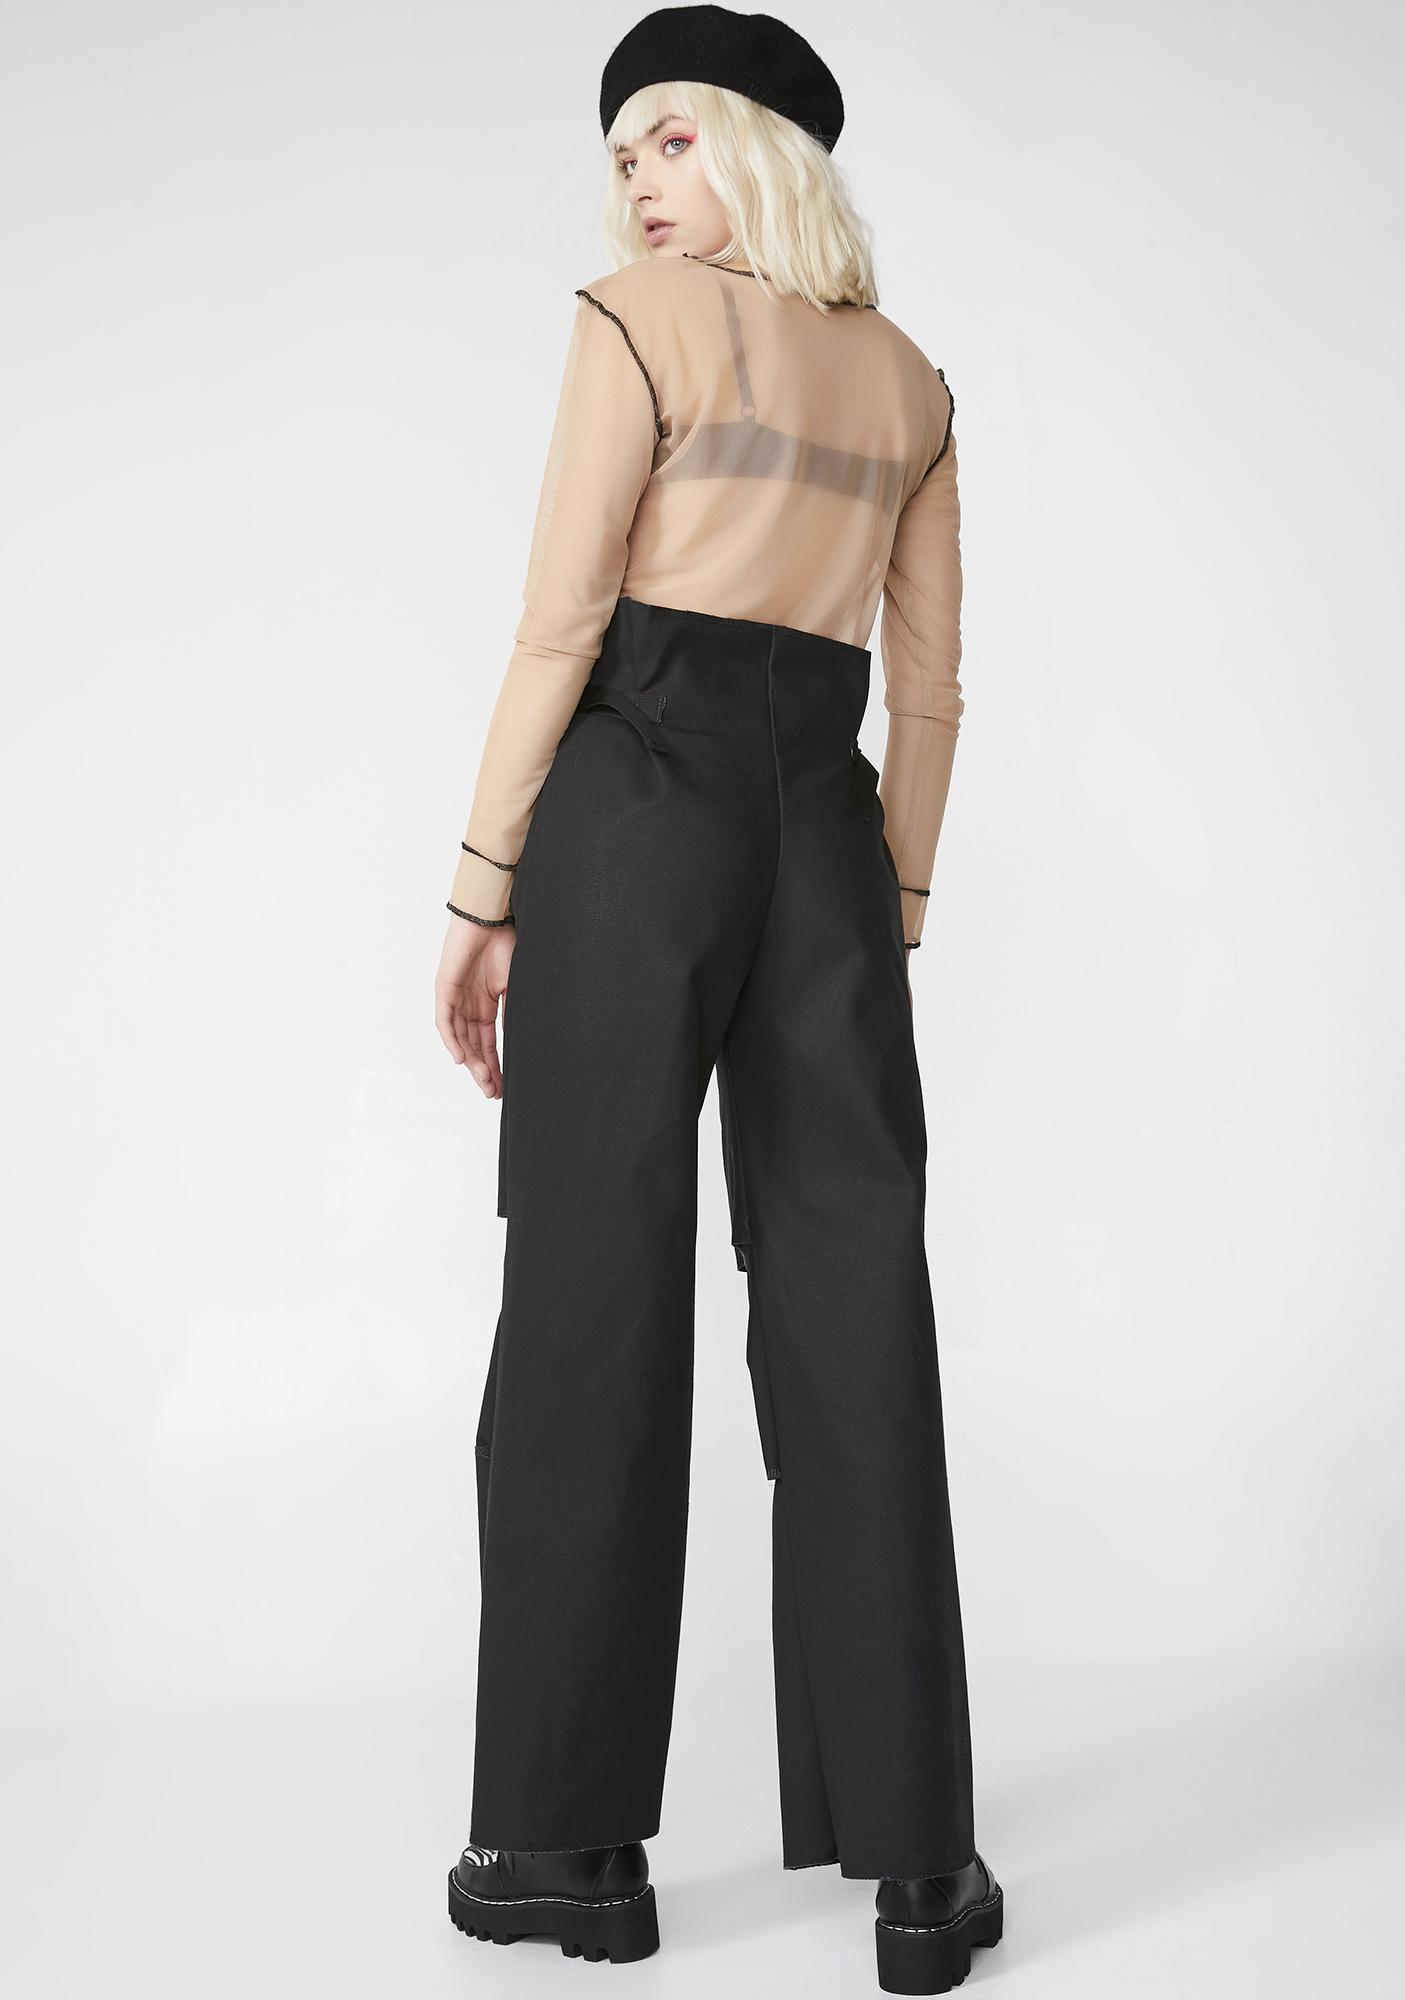 Riccetti Clothing 3 Layered Cake Pants